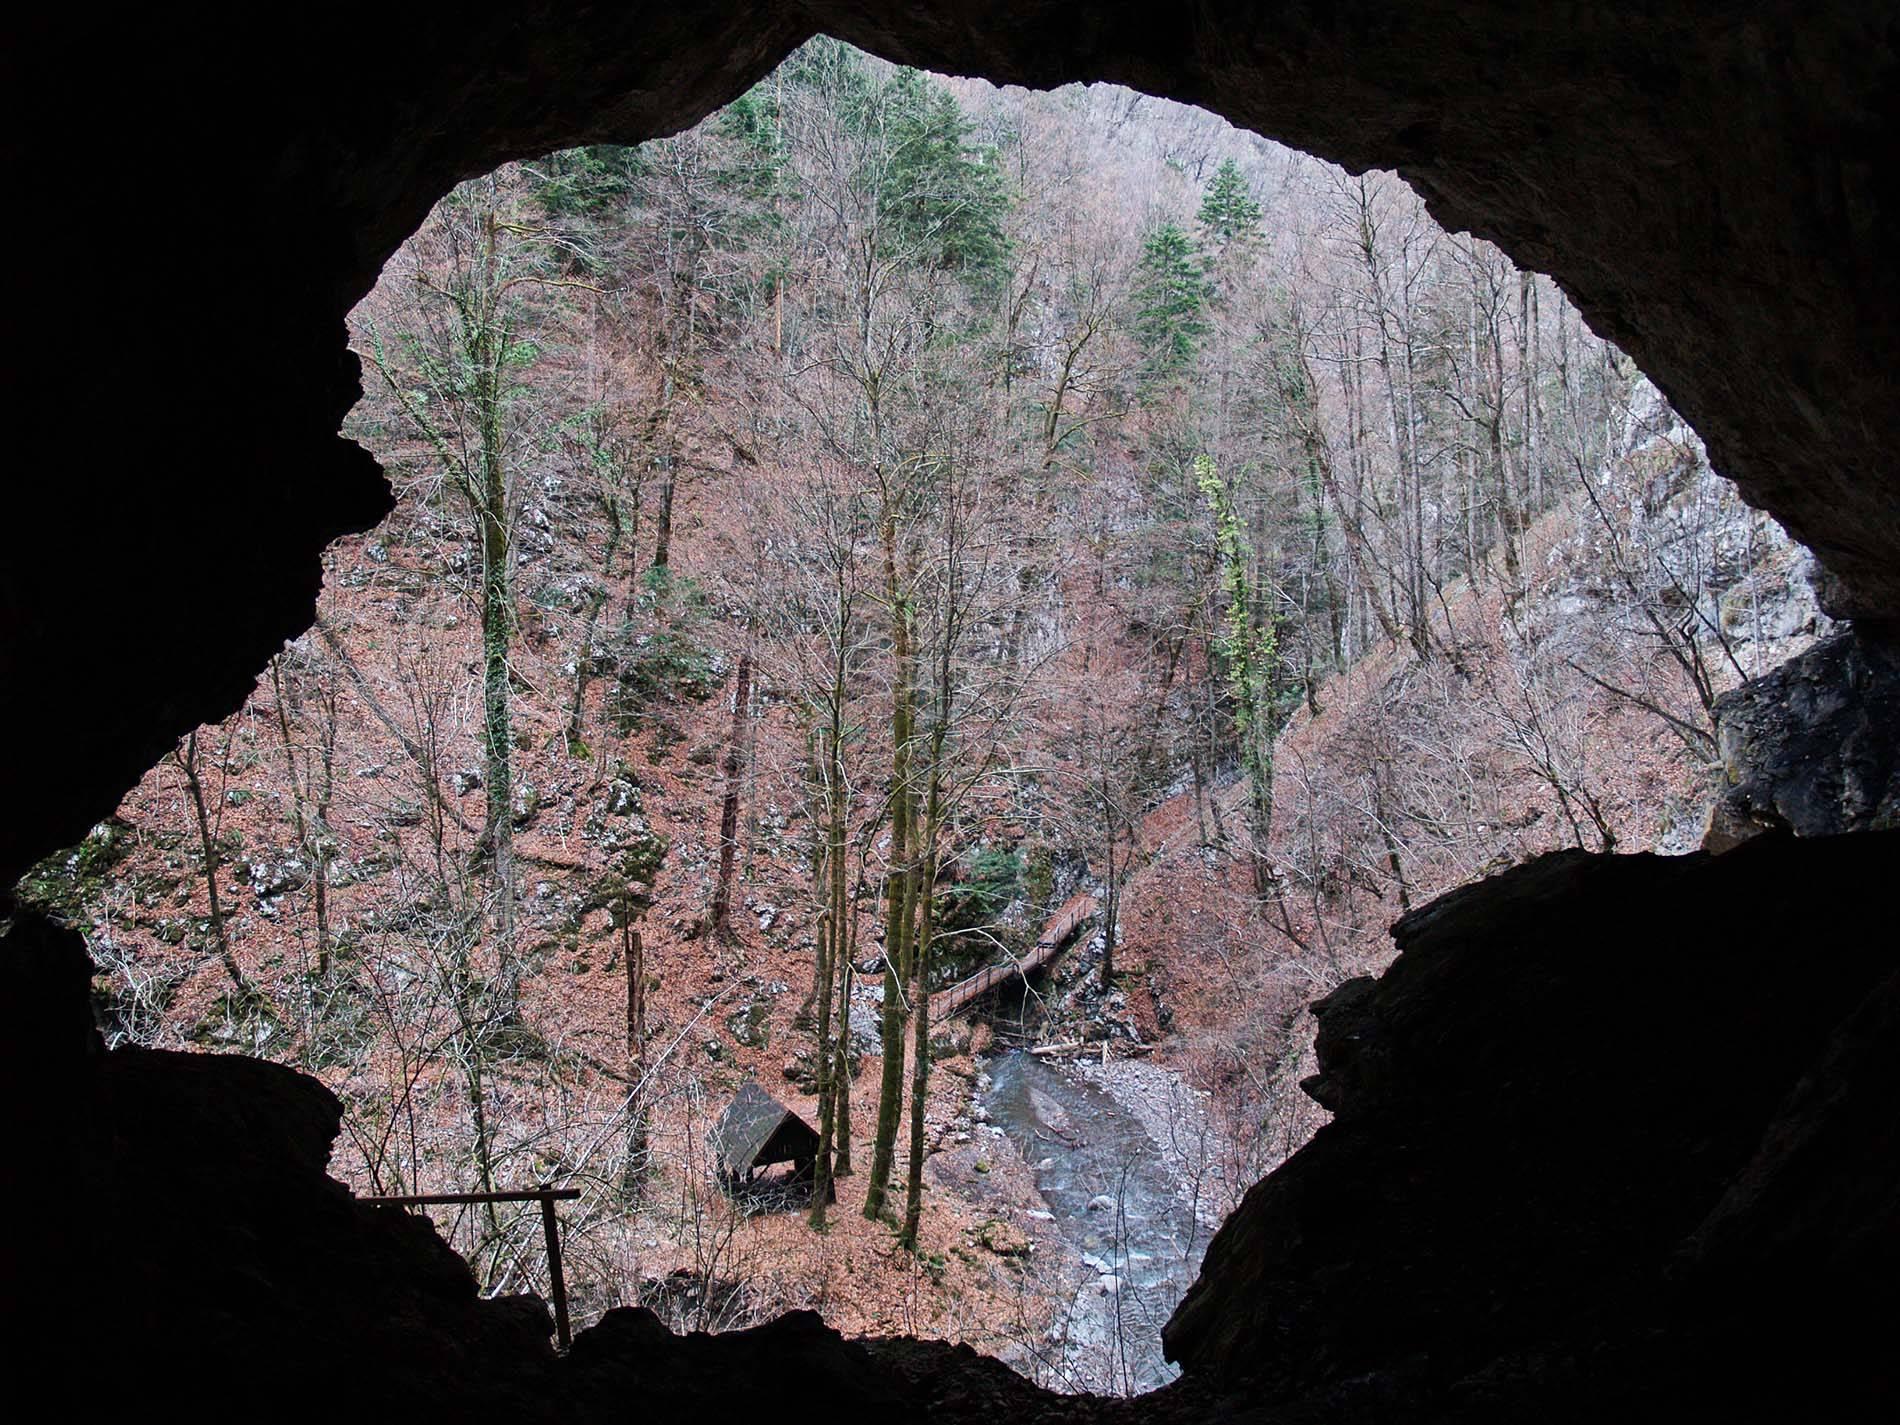 Gorski kotar – the habitat of large carnivores